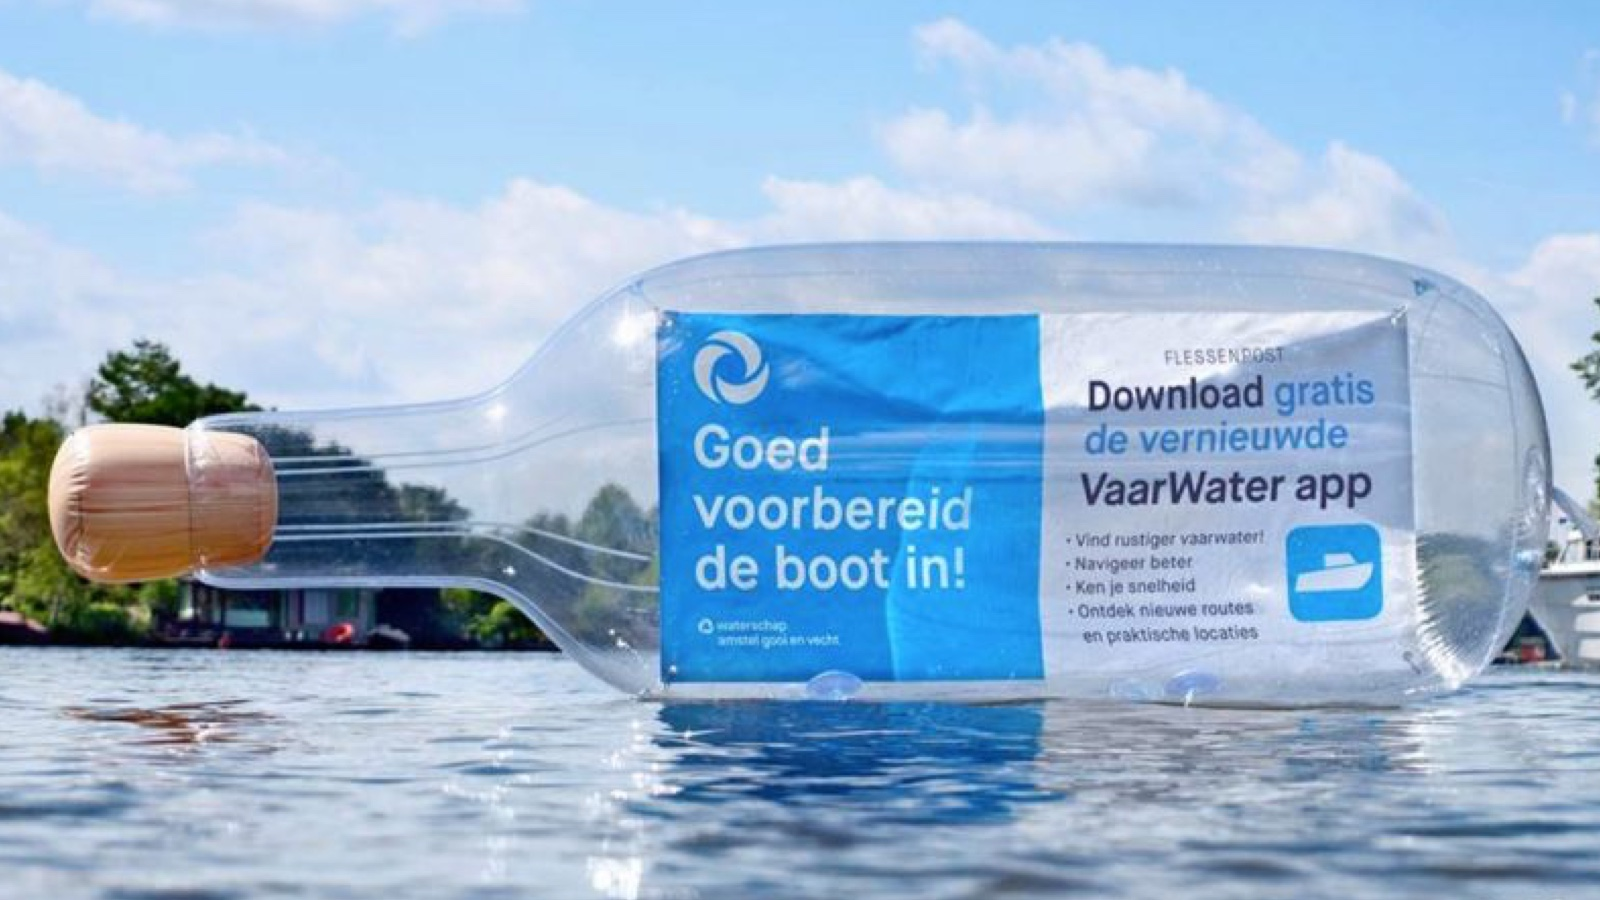 Opblaasbare fles - inflatable bottle - flessnepost activatie 02 - waternet - Publi air